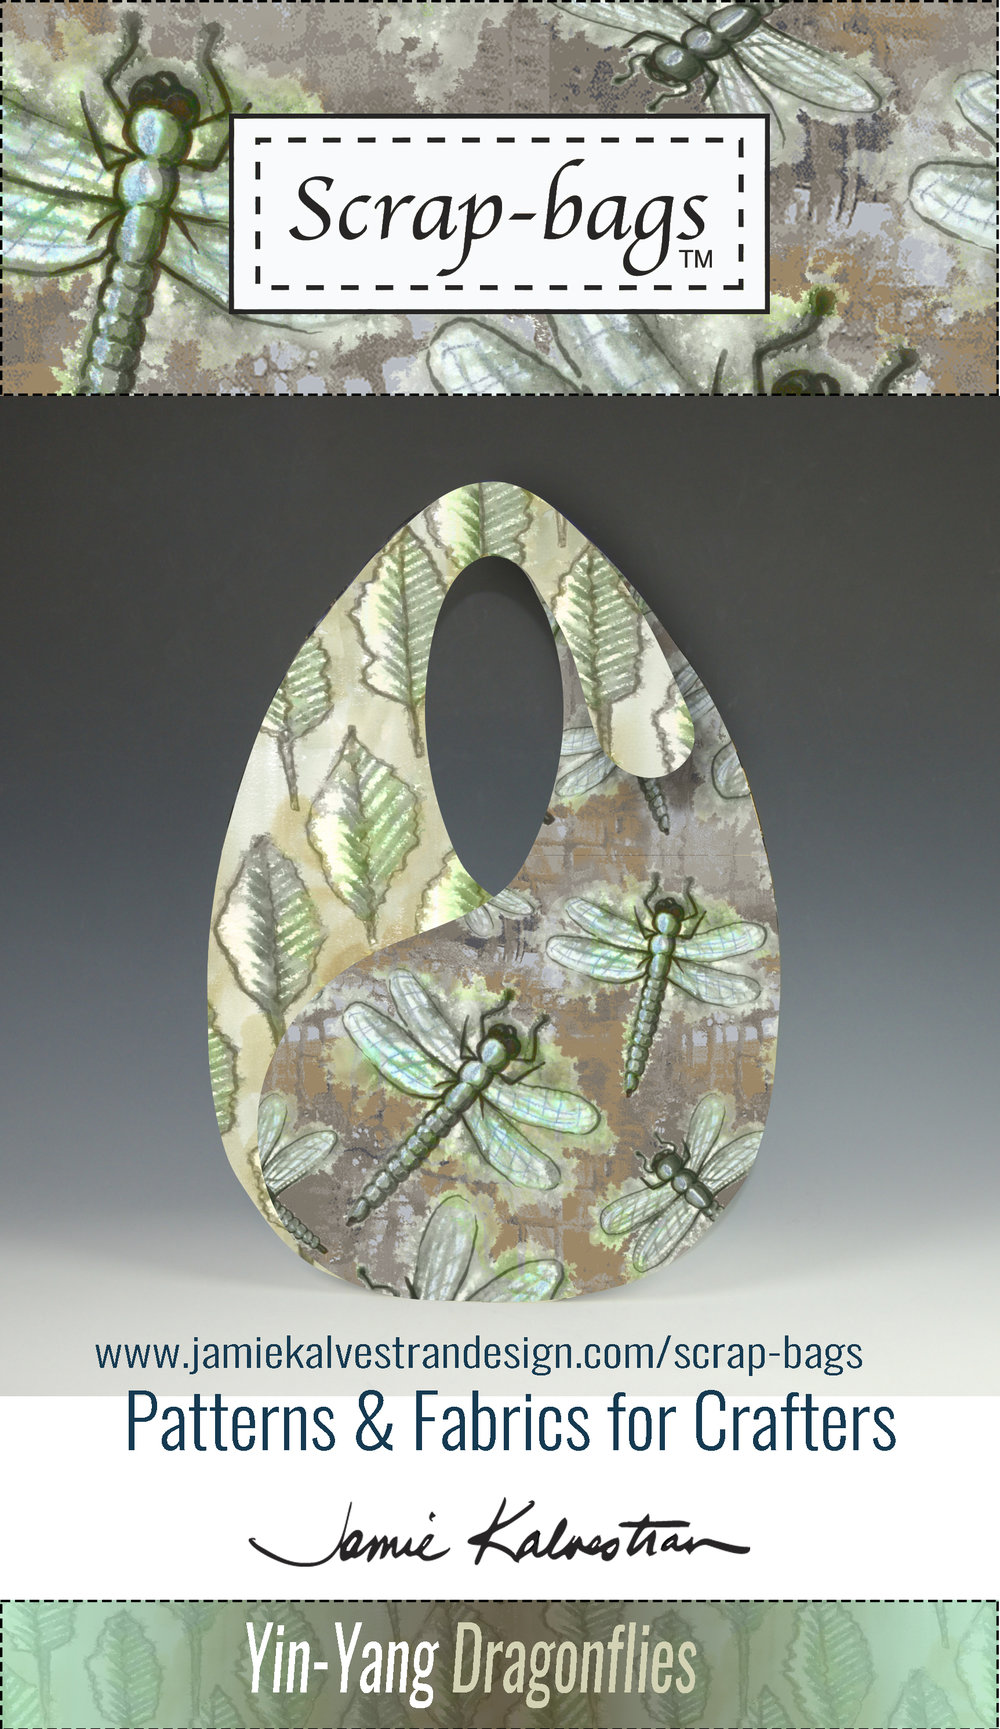 Yin-Yang_Dragonflies_Jamie_Kalvestran_Scrap-bags-V.jpg